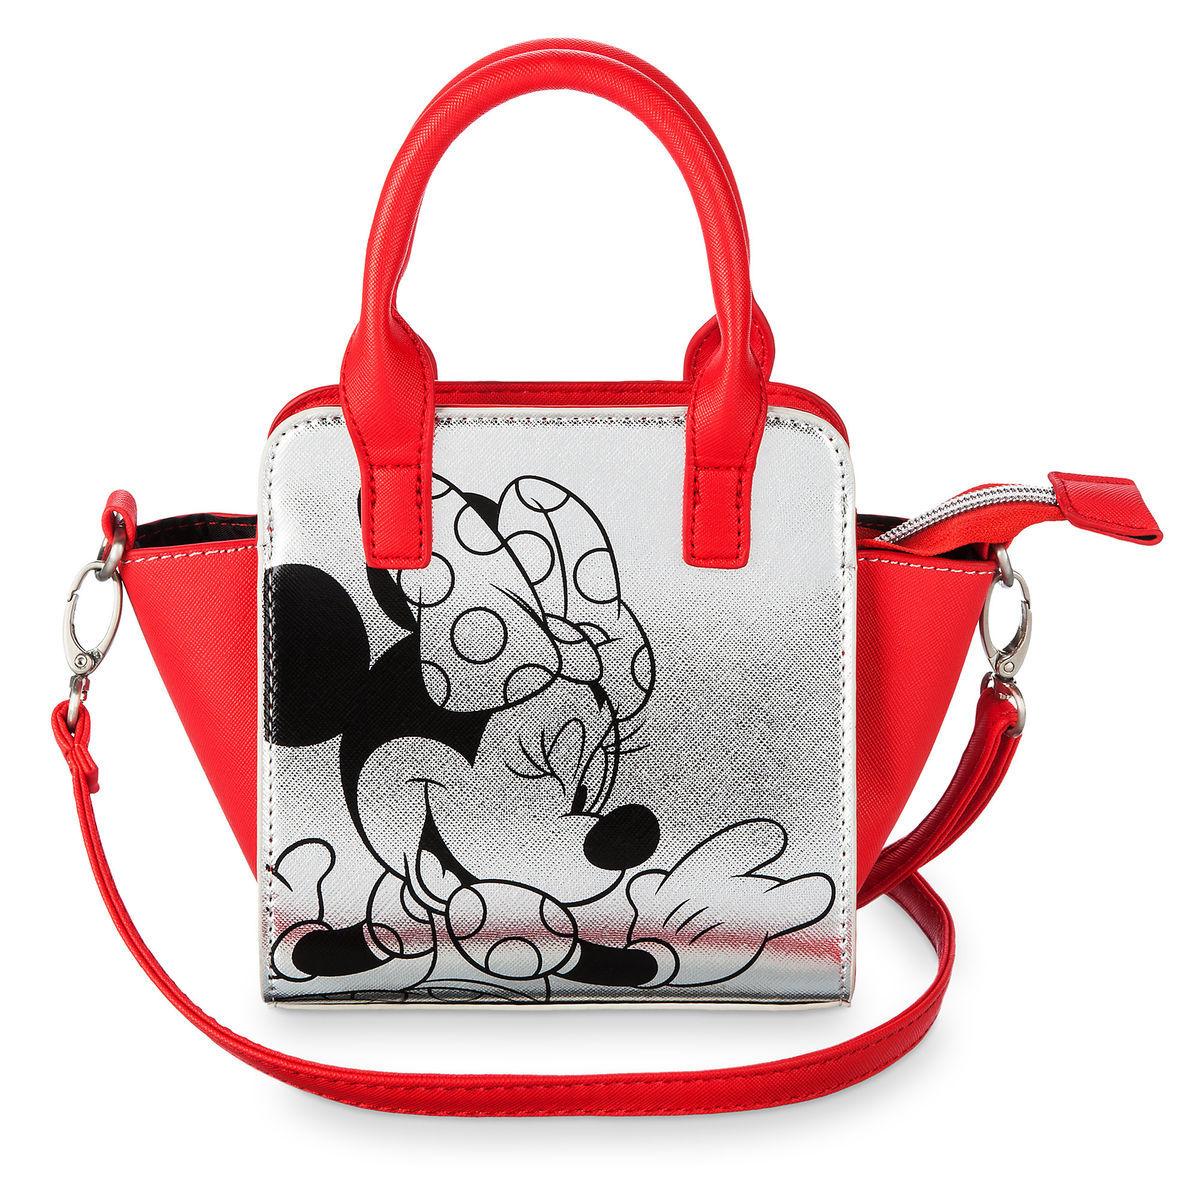 Bolsa Minnie Mouse M08